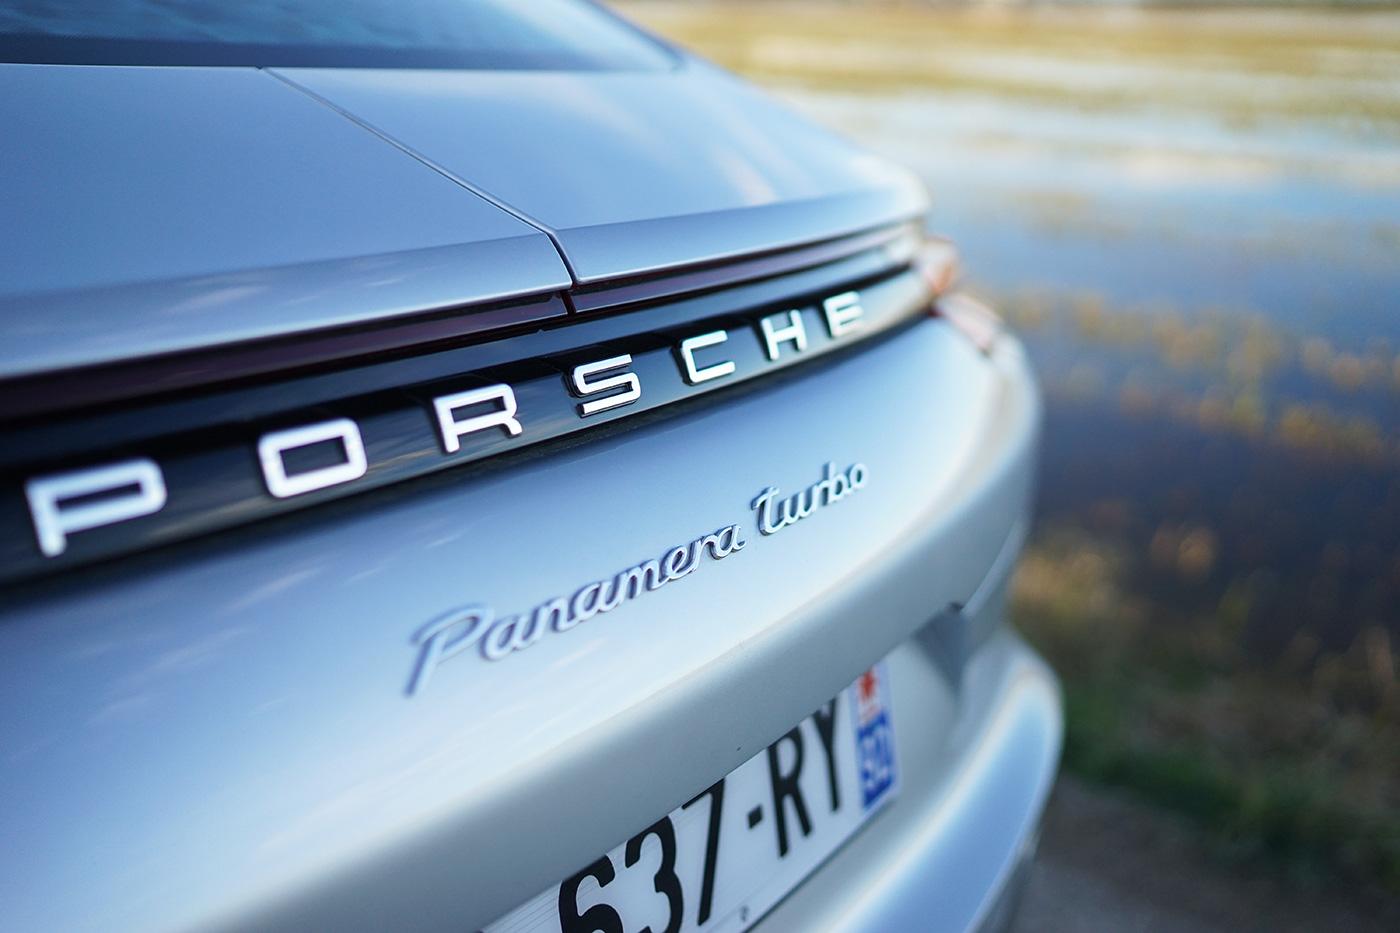 porsche-panamera-turbo-2016